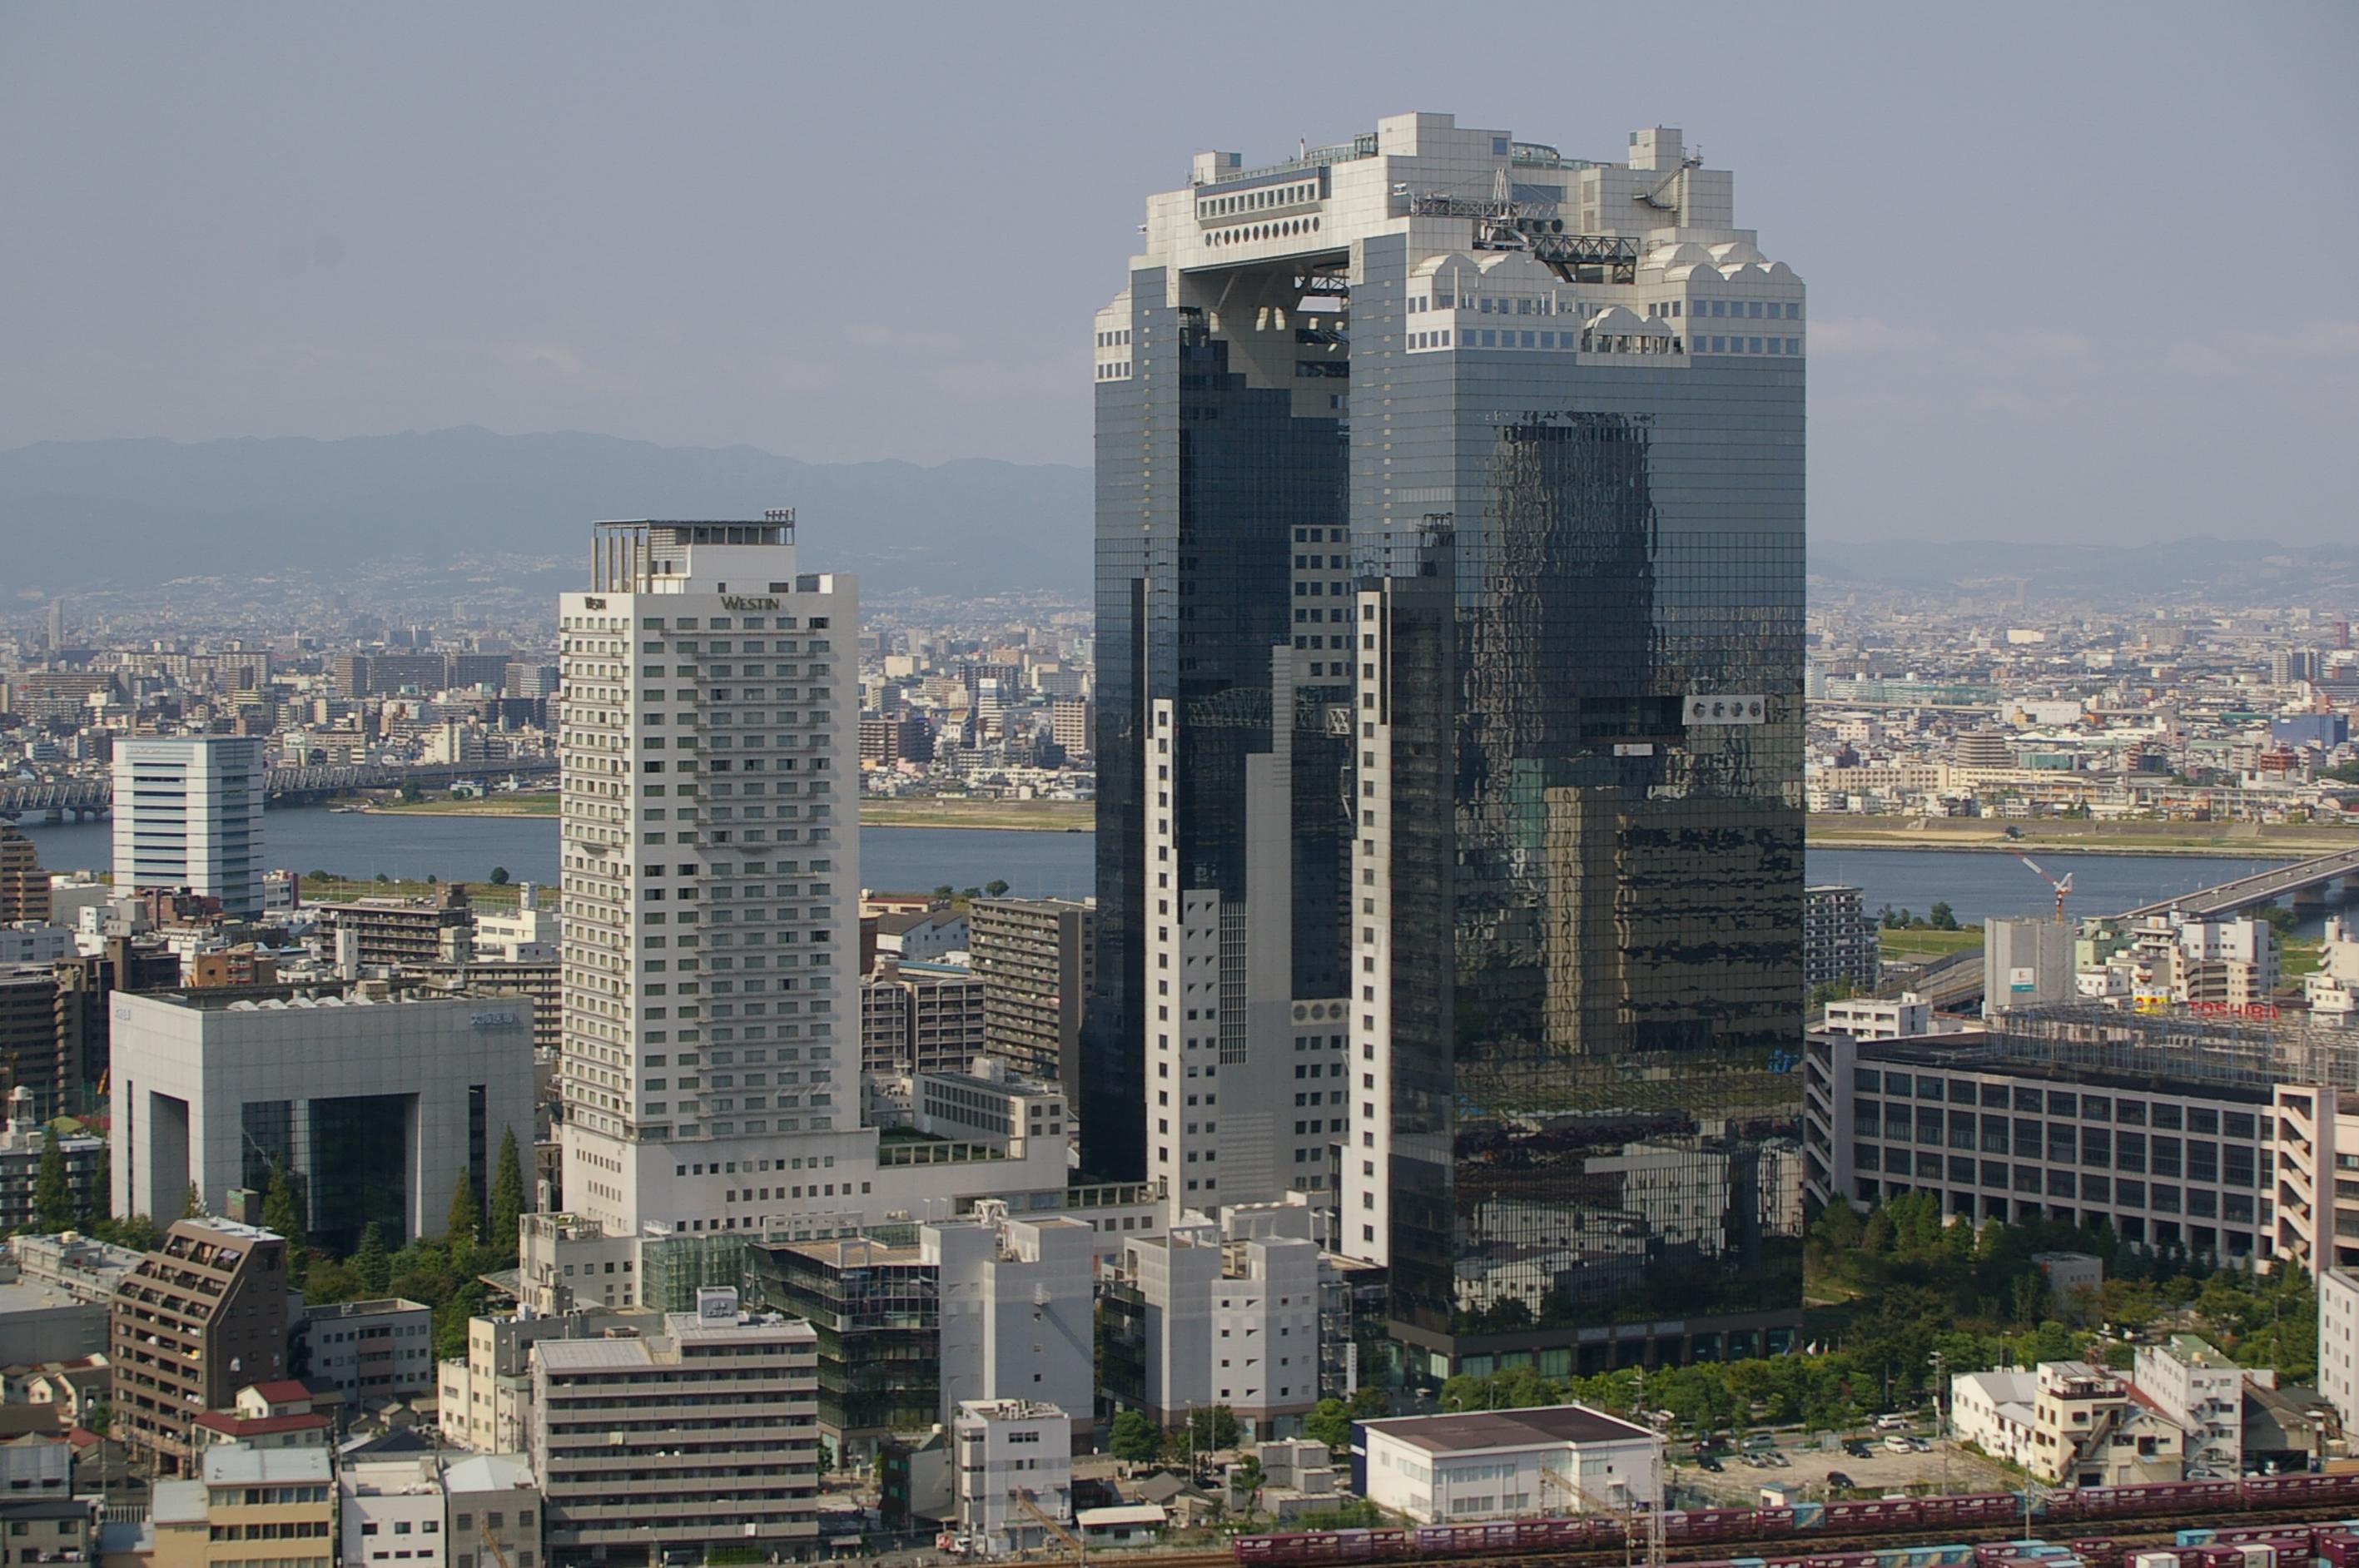 Shin umeda city 01